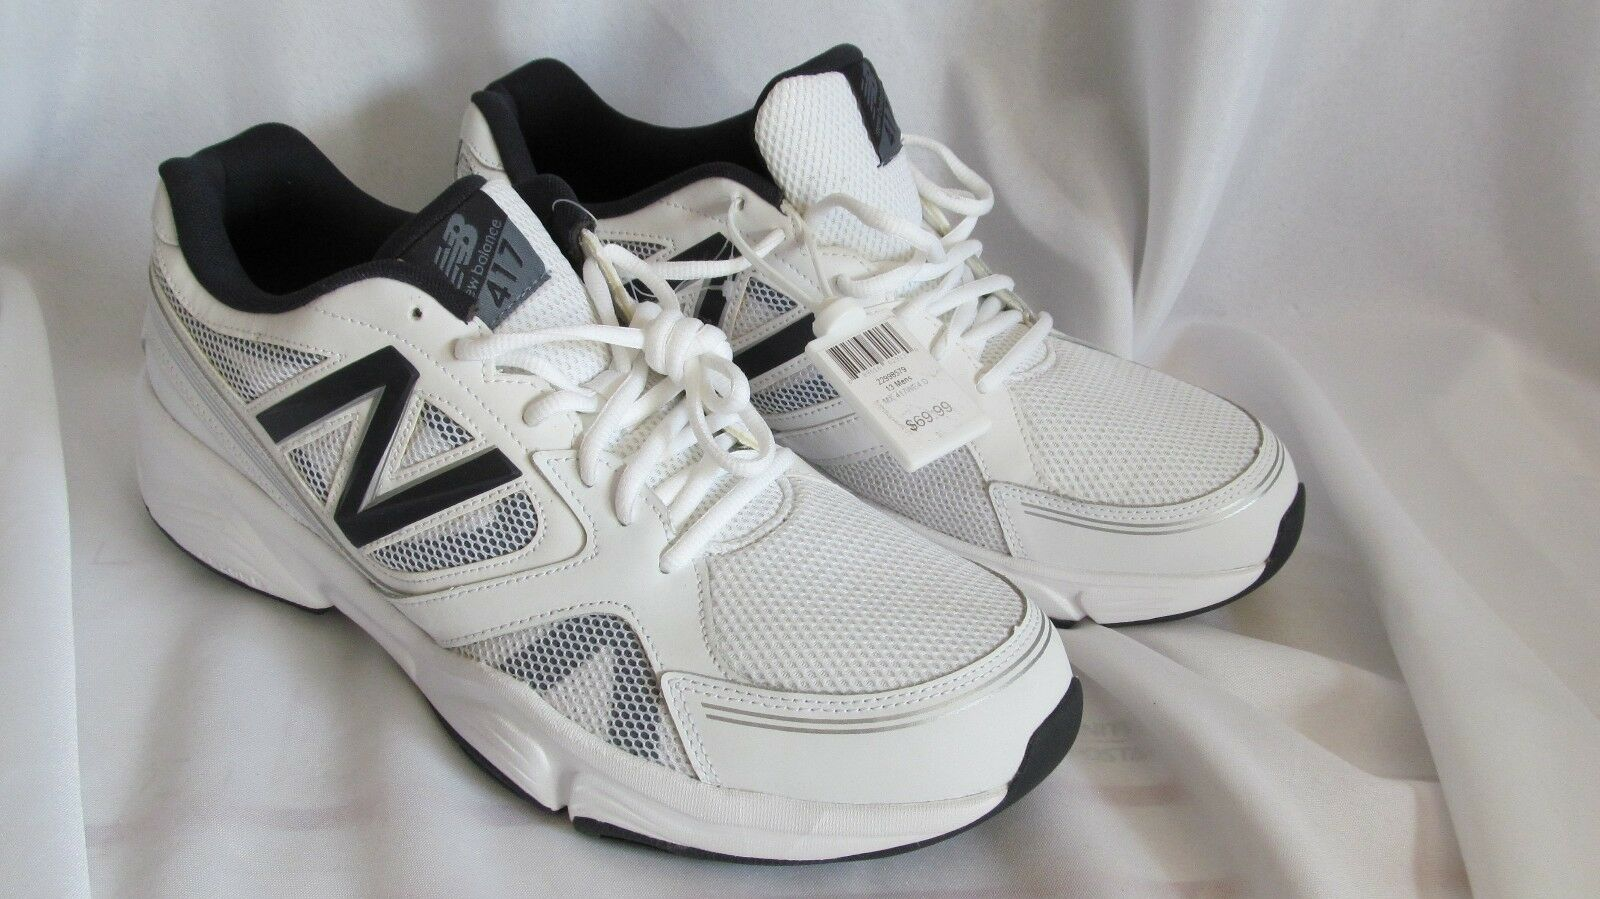 Zapatos para hombre de EE. UU. MX4174E4 D Athletic Training NEW BALANCE